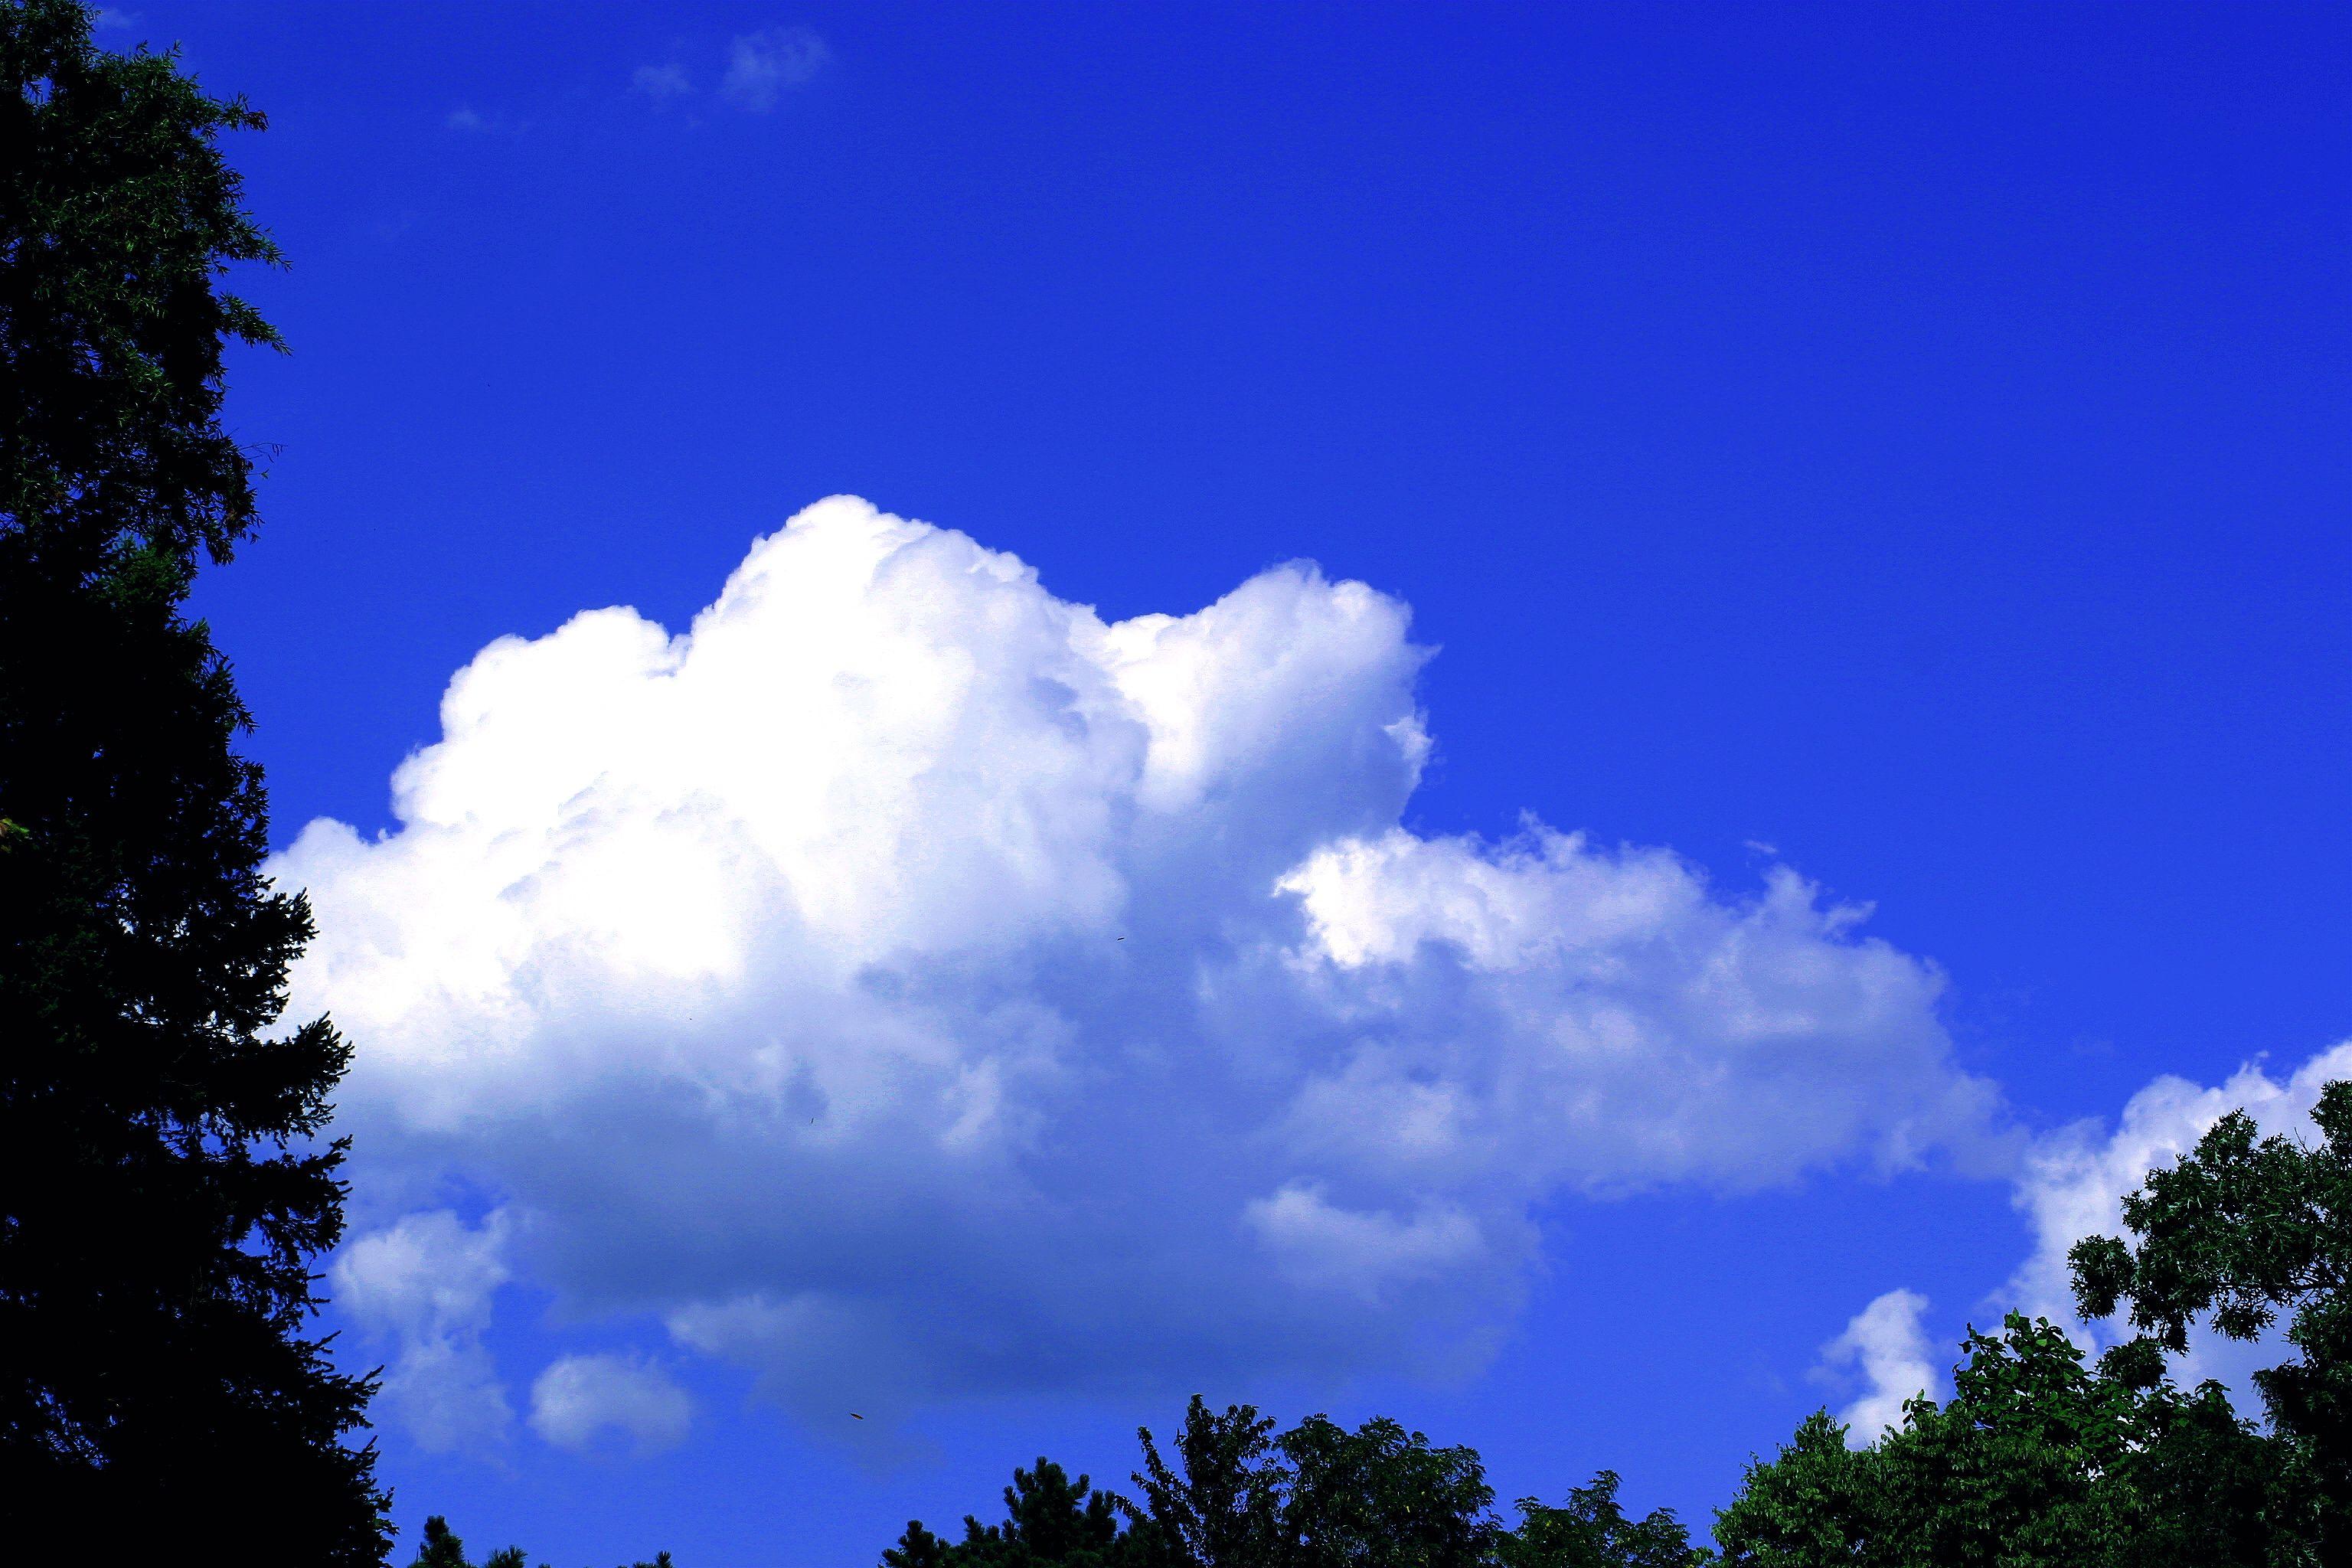 Blue Sky Clouds - Original (3,072 2,048 Pixels,